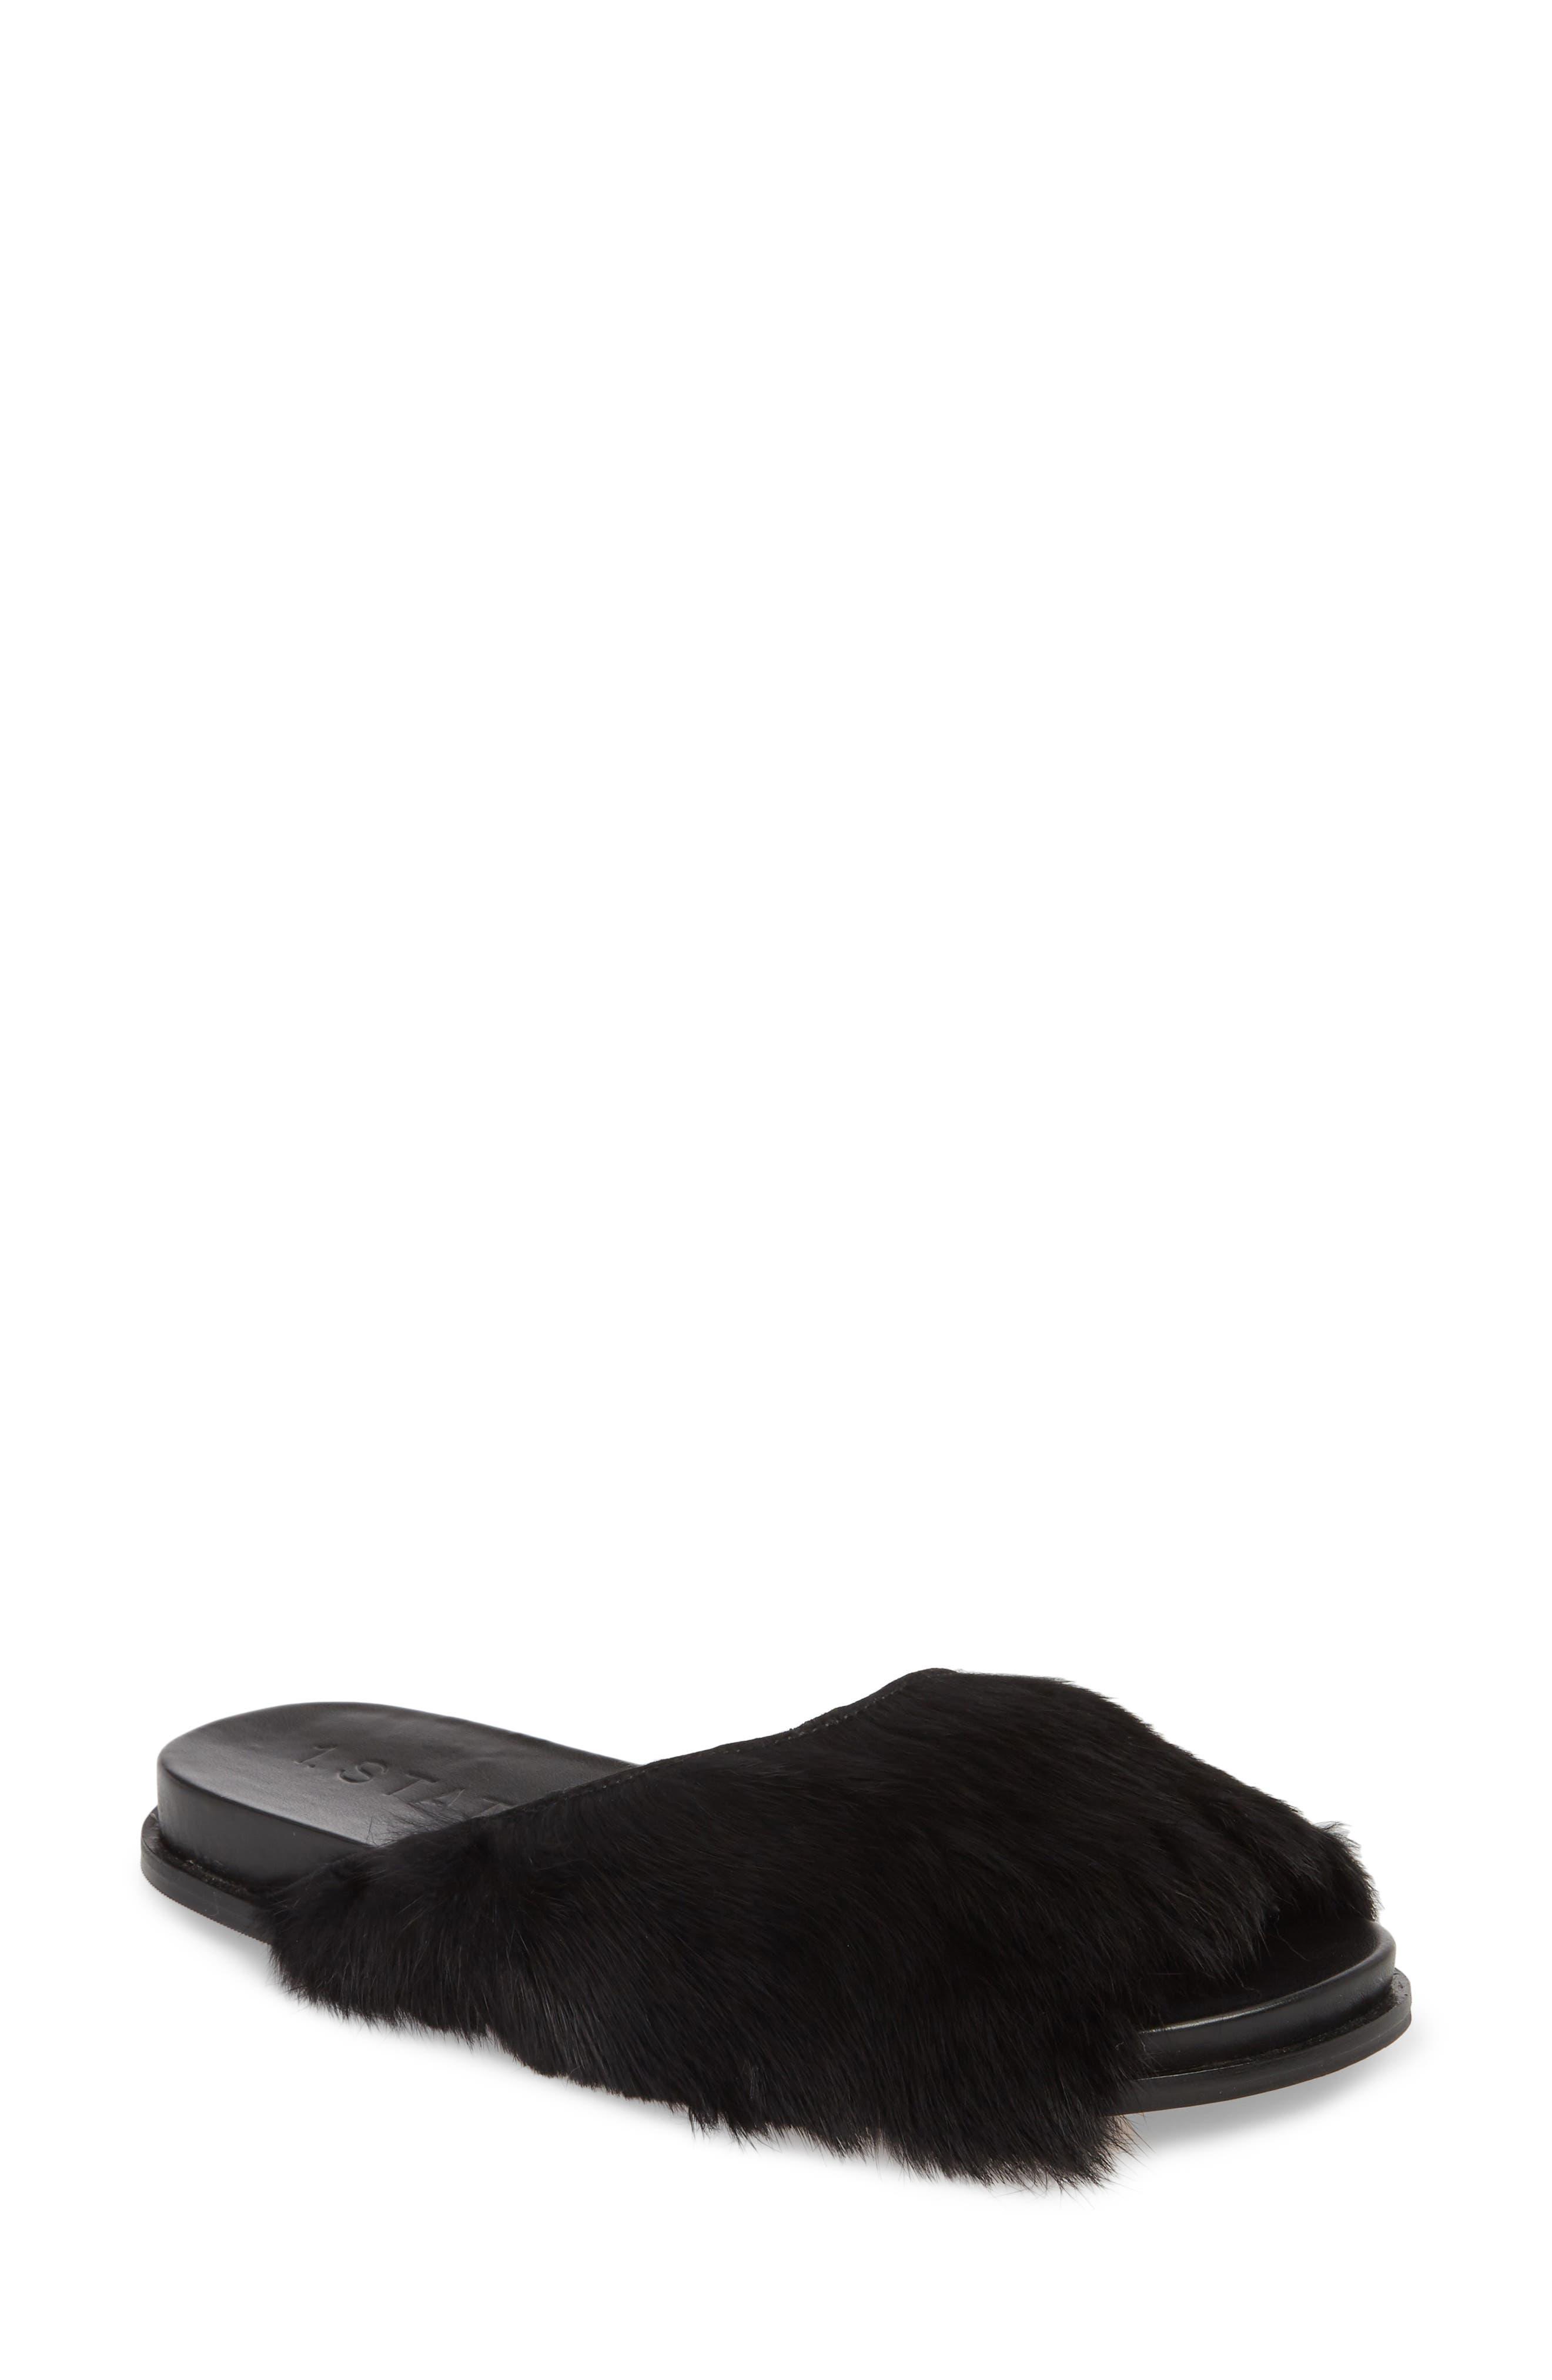 Onora Genuine Rabbit Fur Slide Sandal,                         Main,                         color, Black Rabbit Fur